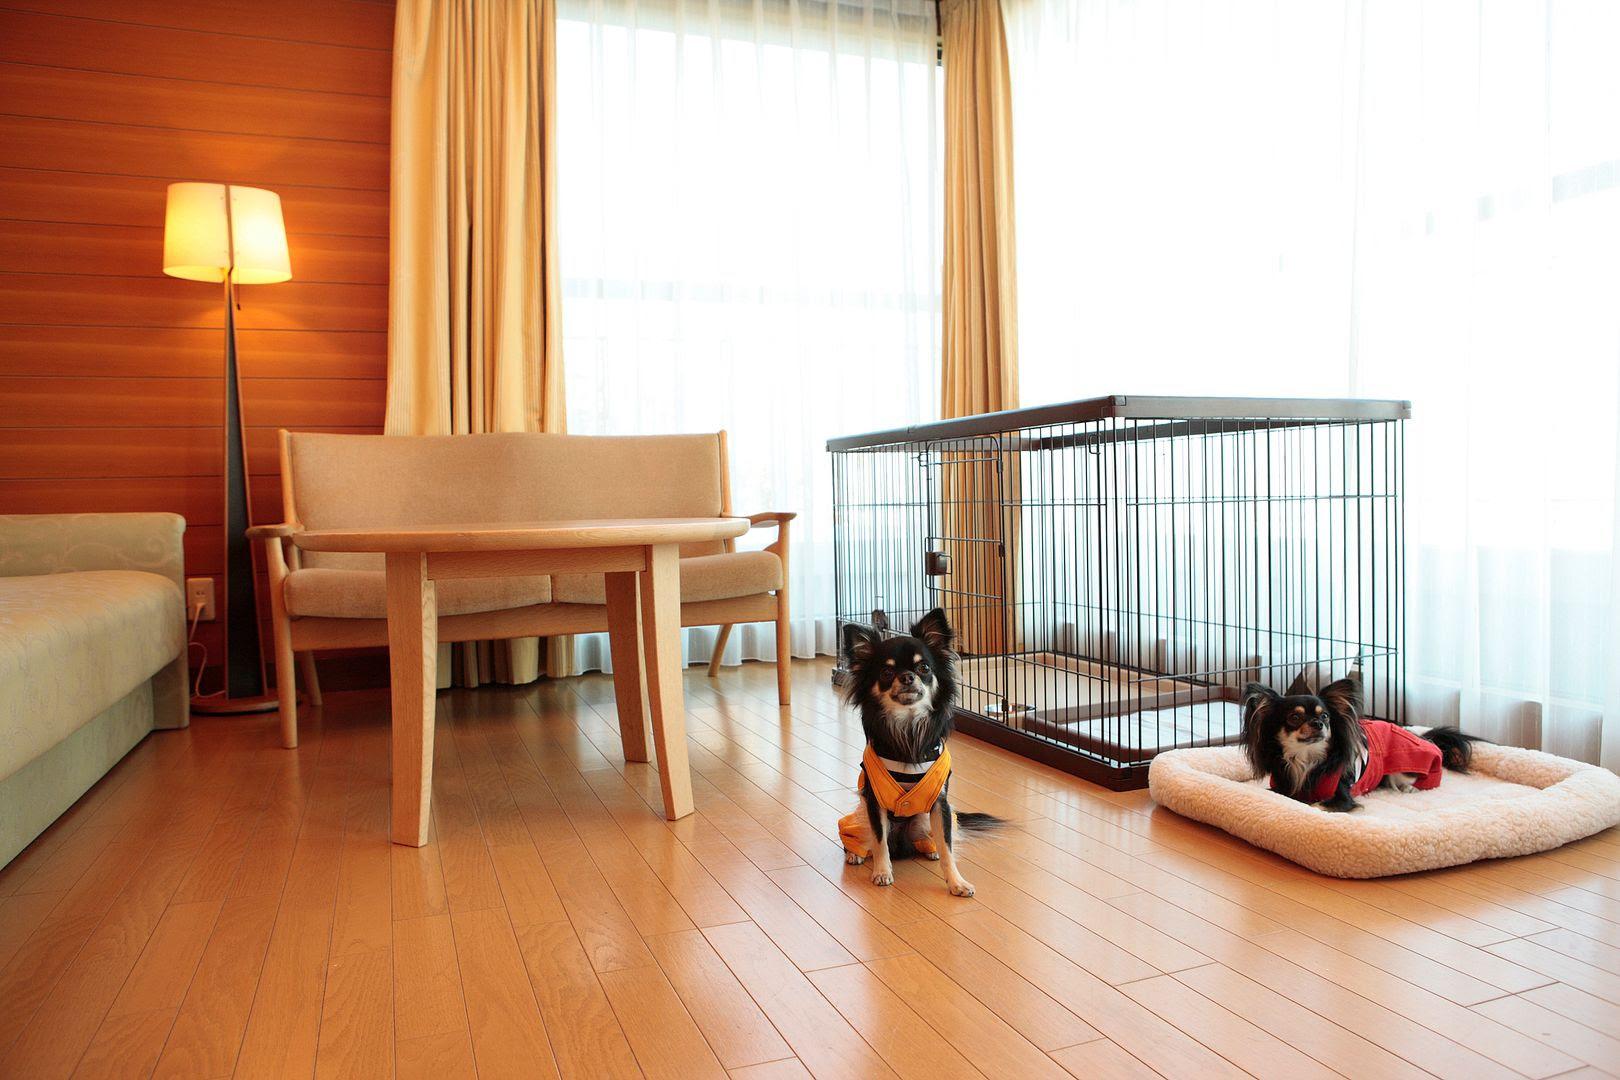 photo Hilton Odawara.jpg